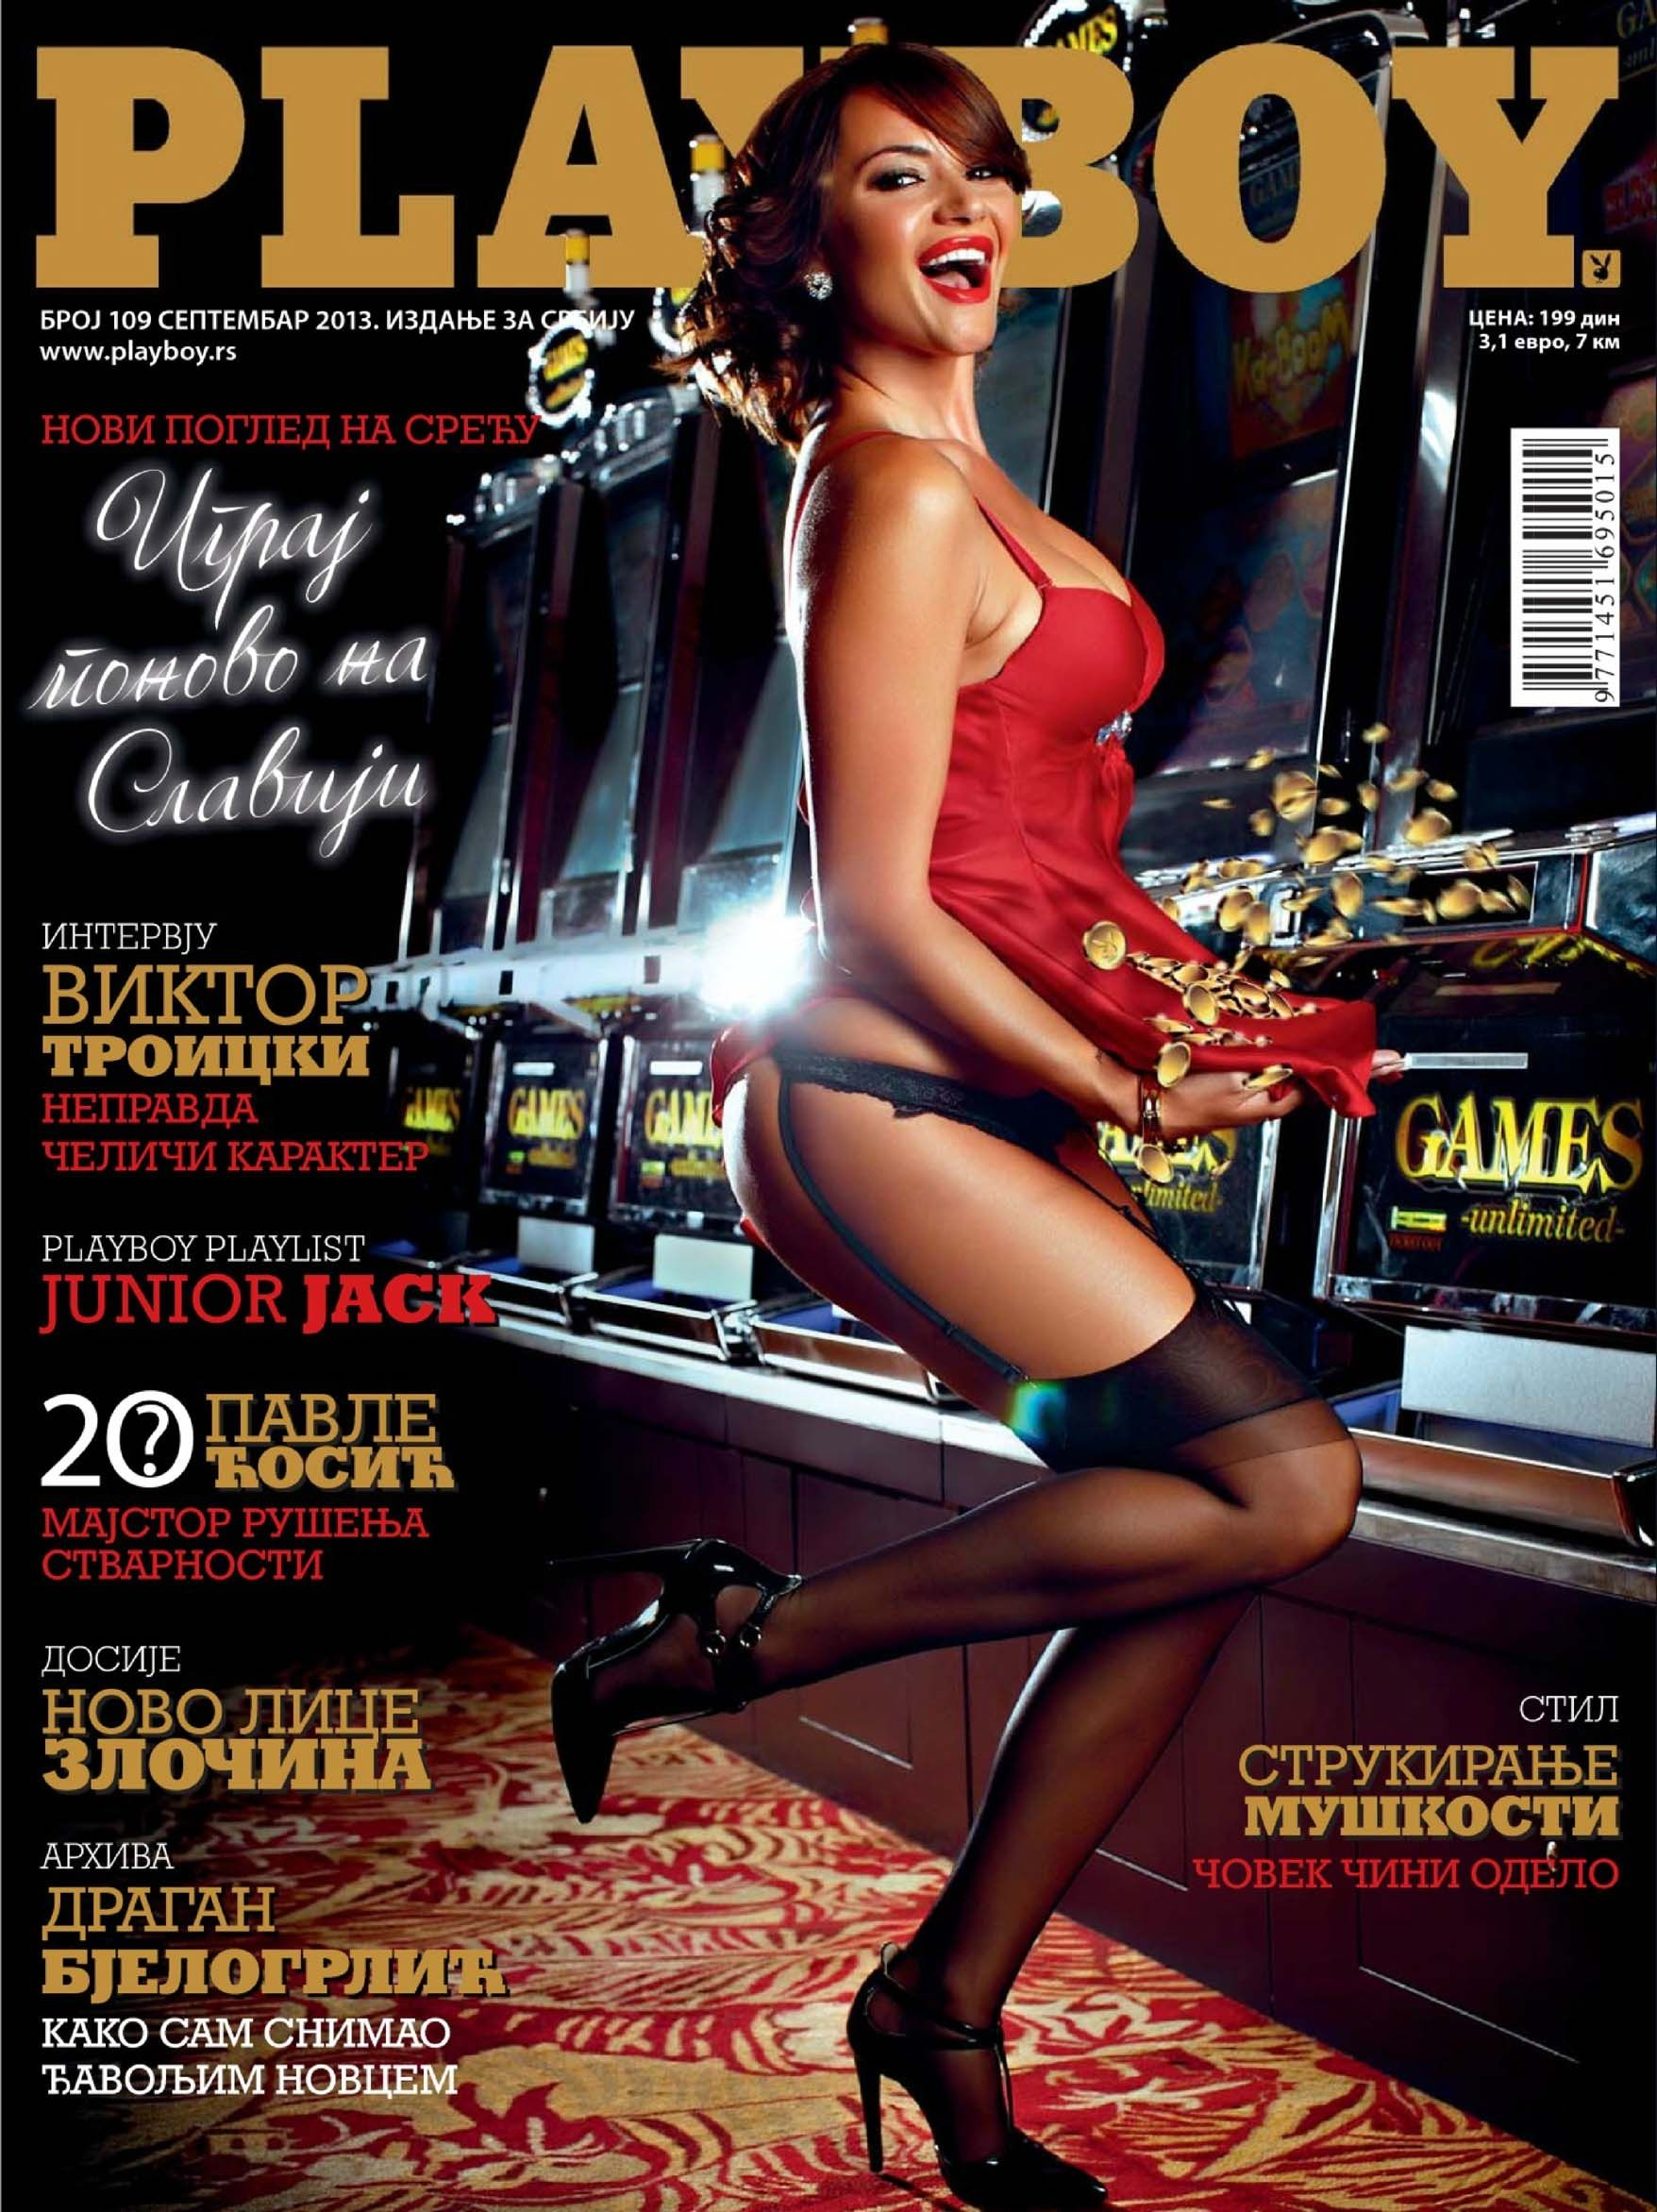 Ana Milojkovic playboy serbia - september 2013 pdf | 106 pages | serbian